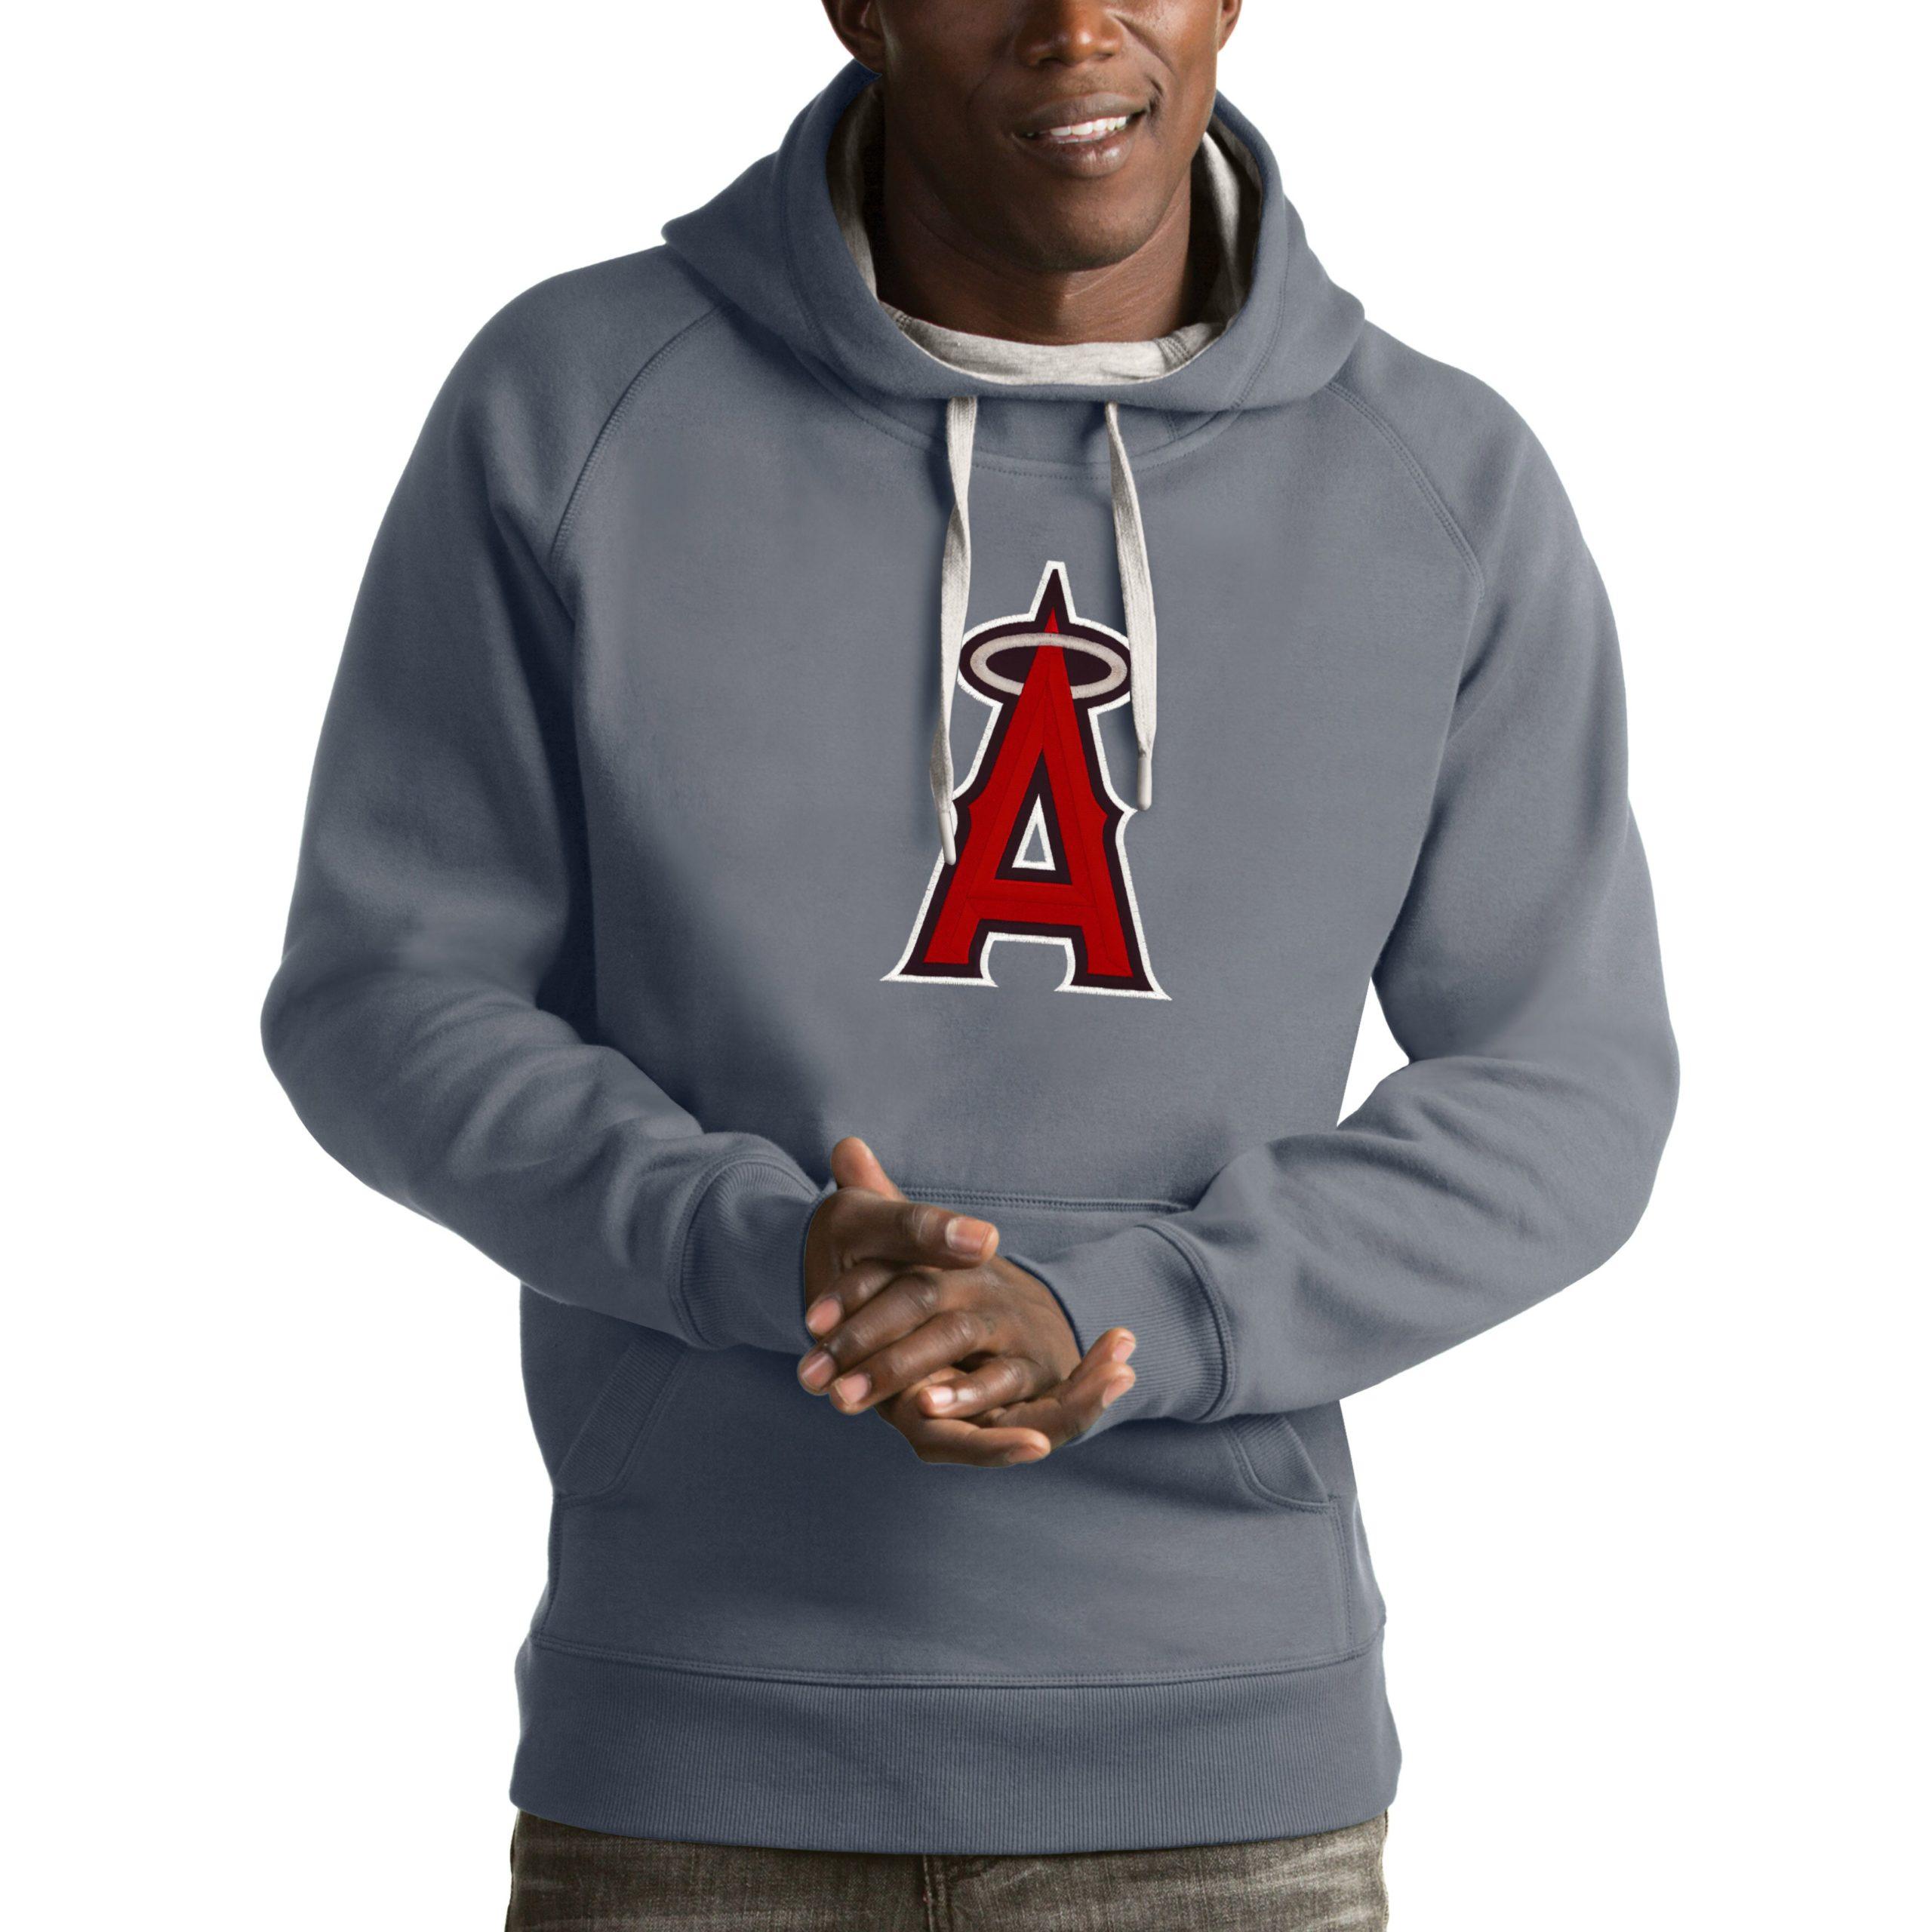 Los Angeles Angels Antigua Victory Pullover Hoodie - Heathered Gray